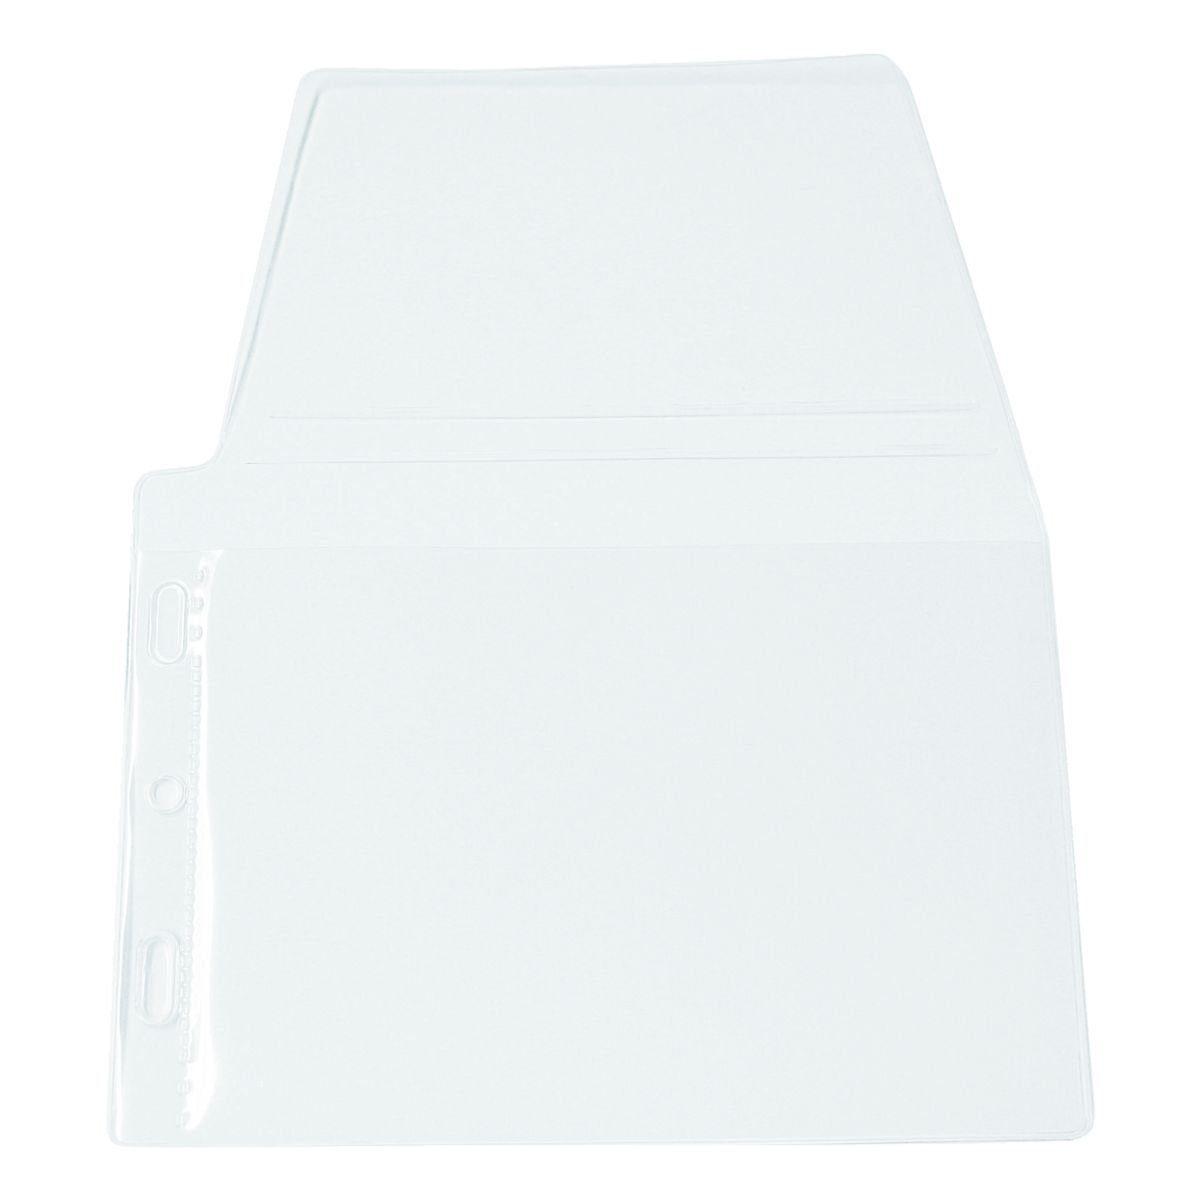 Probeco CD/DVD/Blu-ray-Schutzhüllen